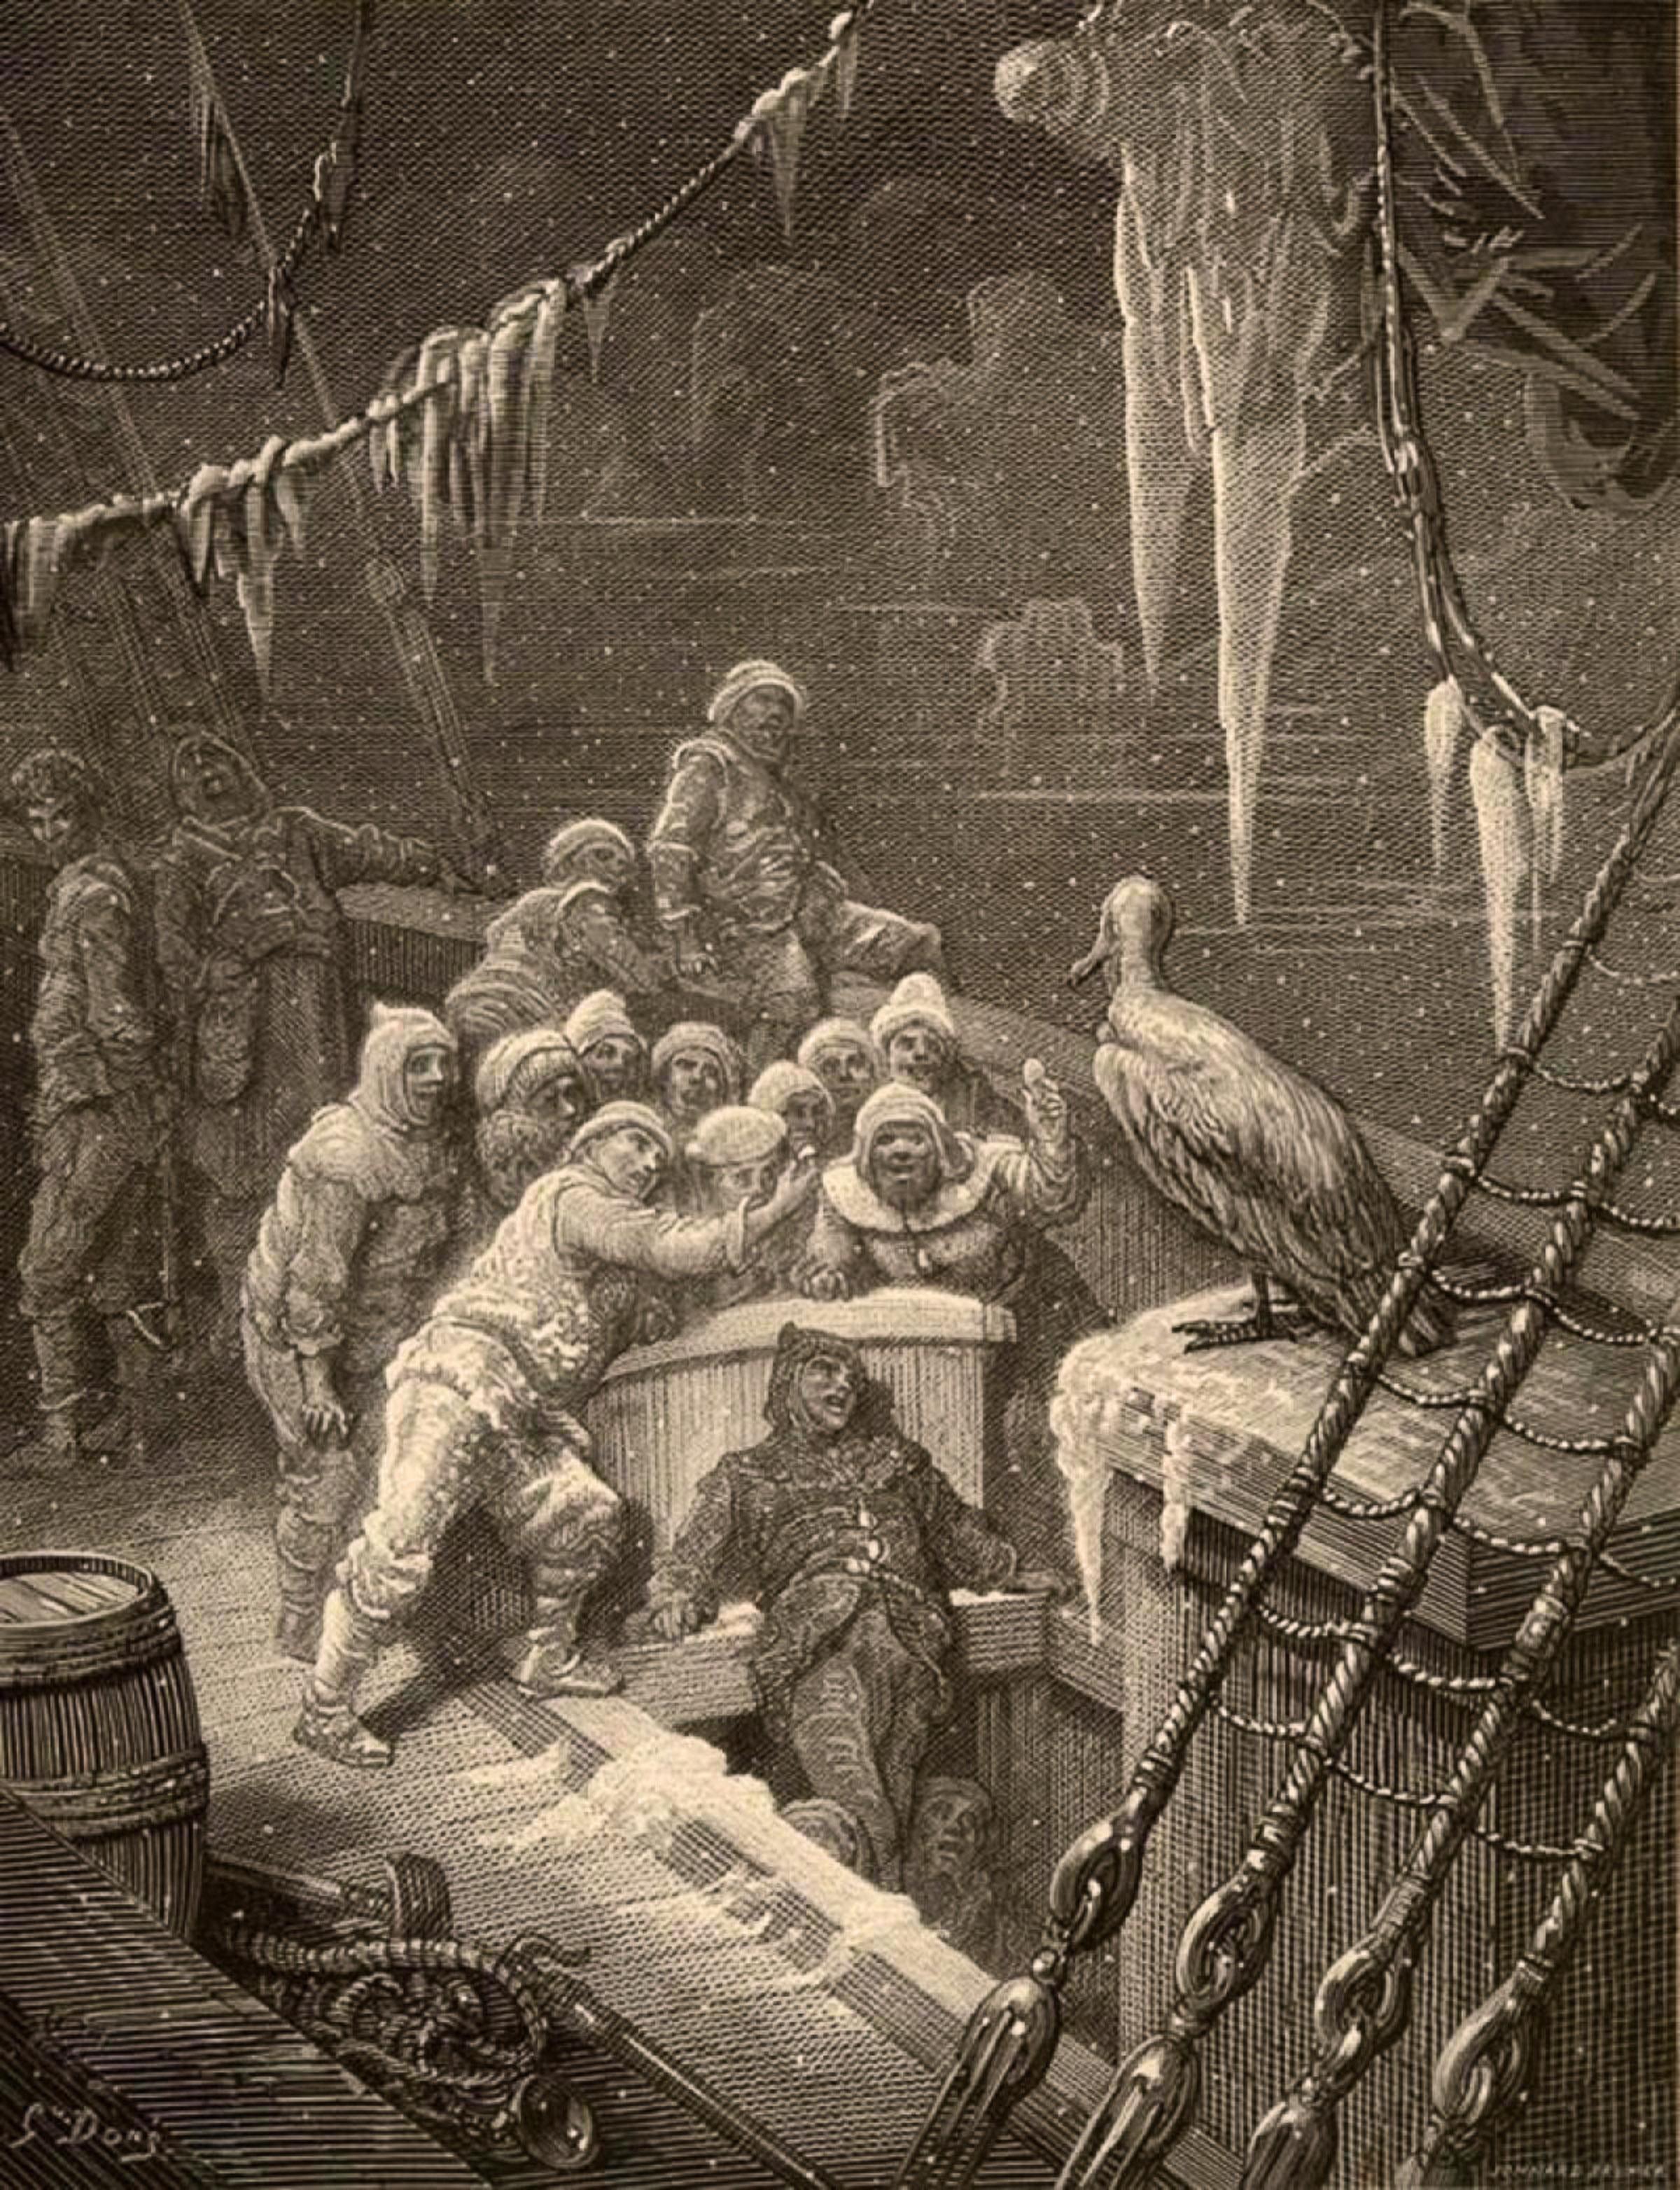 Rime_of_the_Ancient_Mariner-Albatross-Dore.jpg